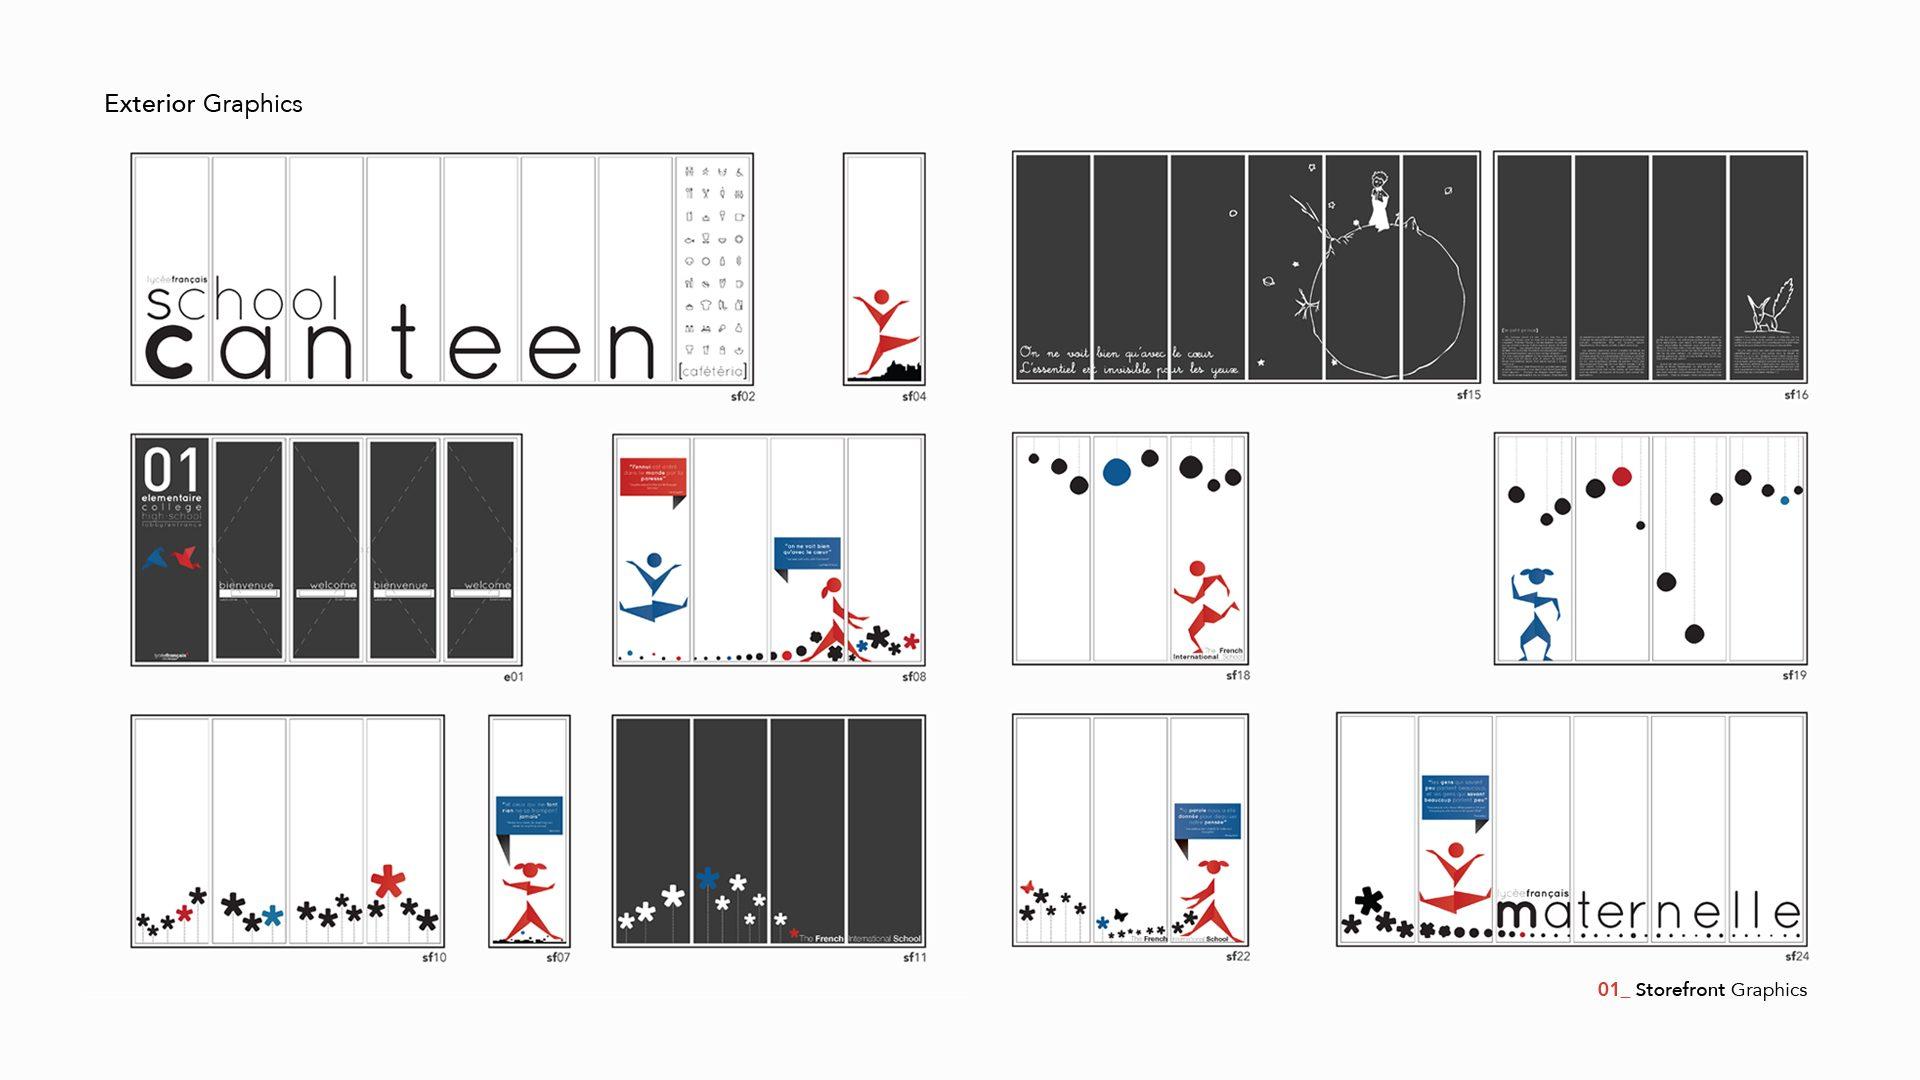 01-LFC_GraphicDesign_04